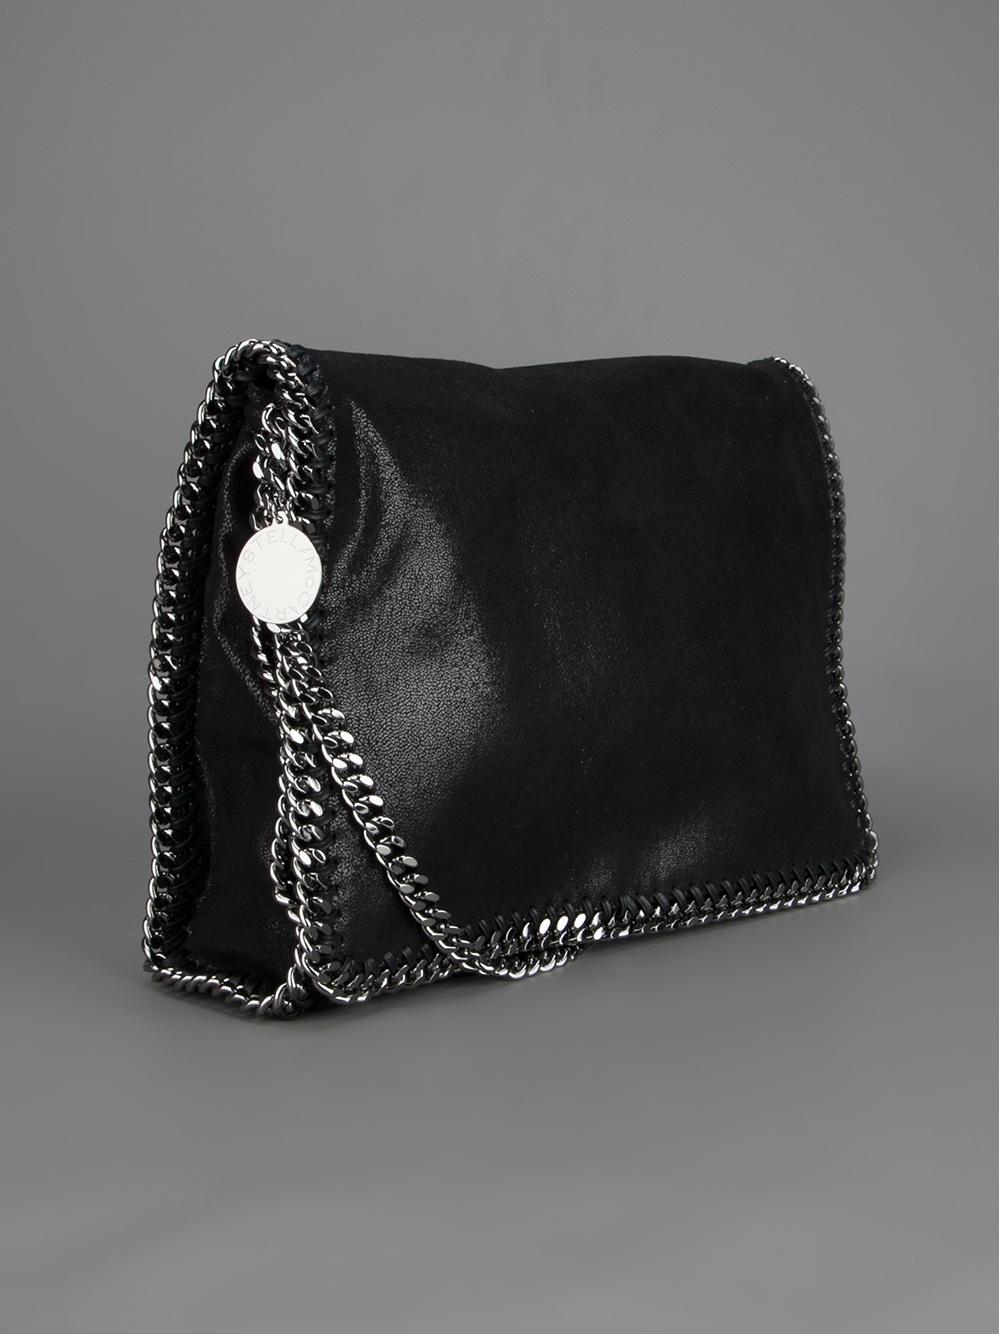 0c08dee985128 Stella McCartney 'Falabella' Shoulder Bag in Black - Lyst